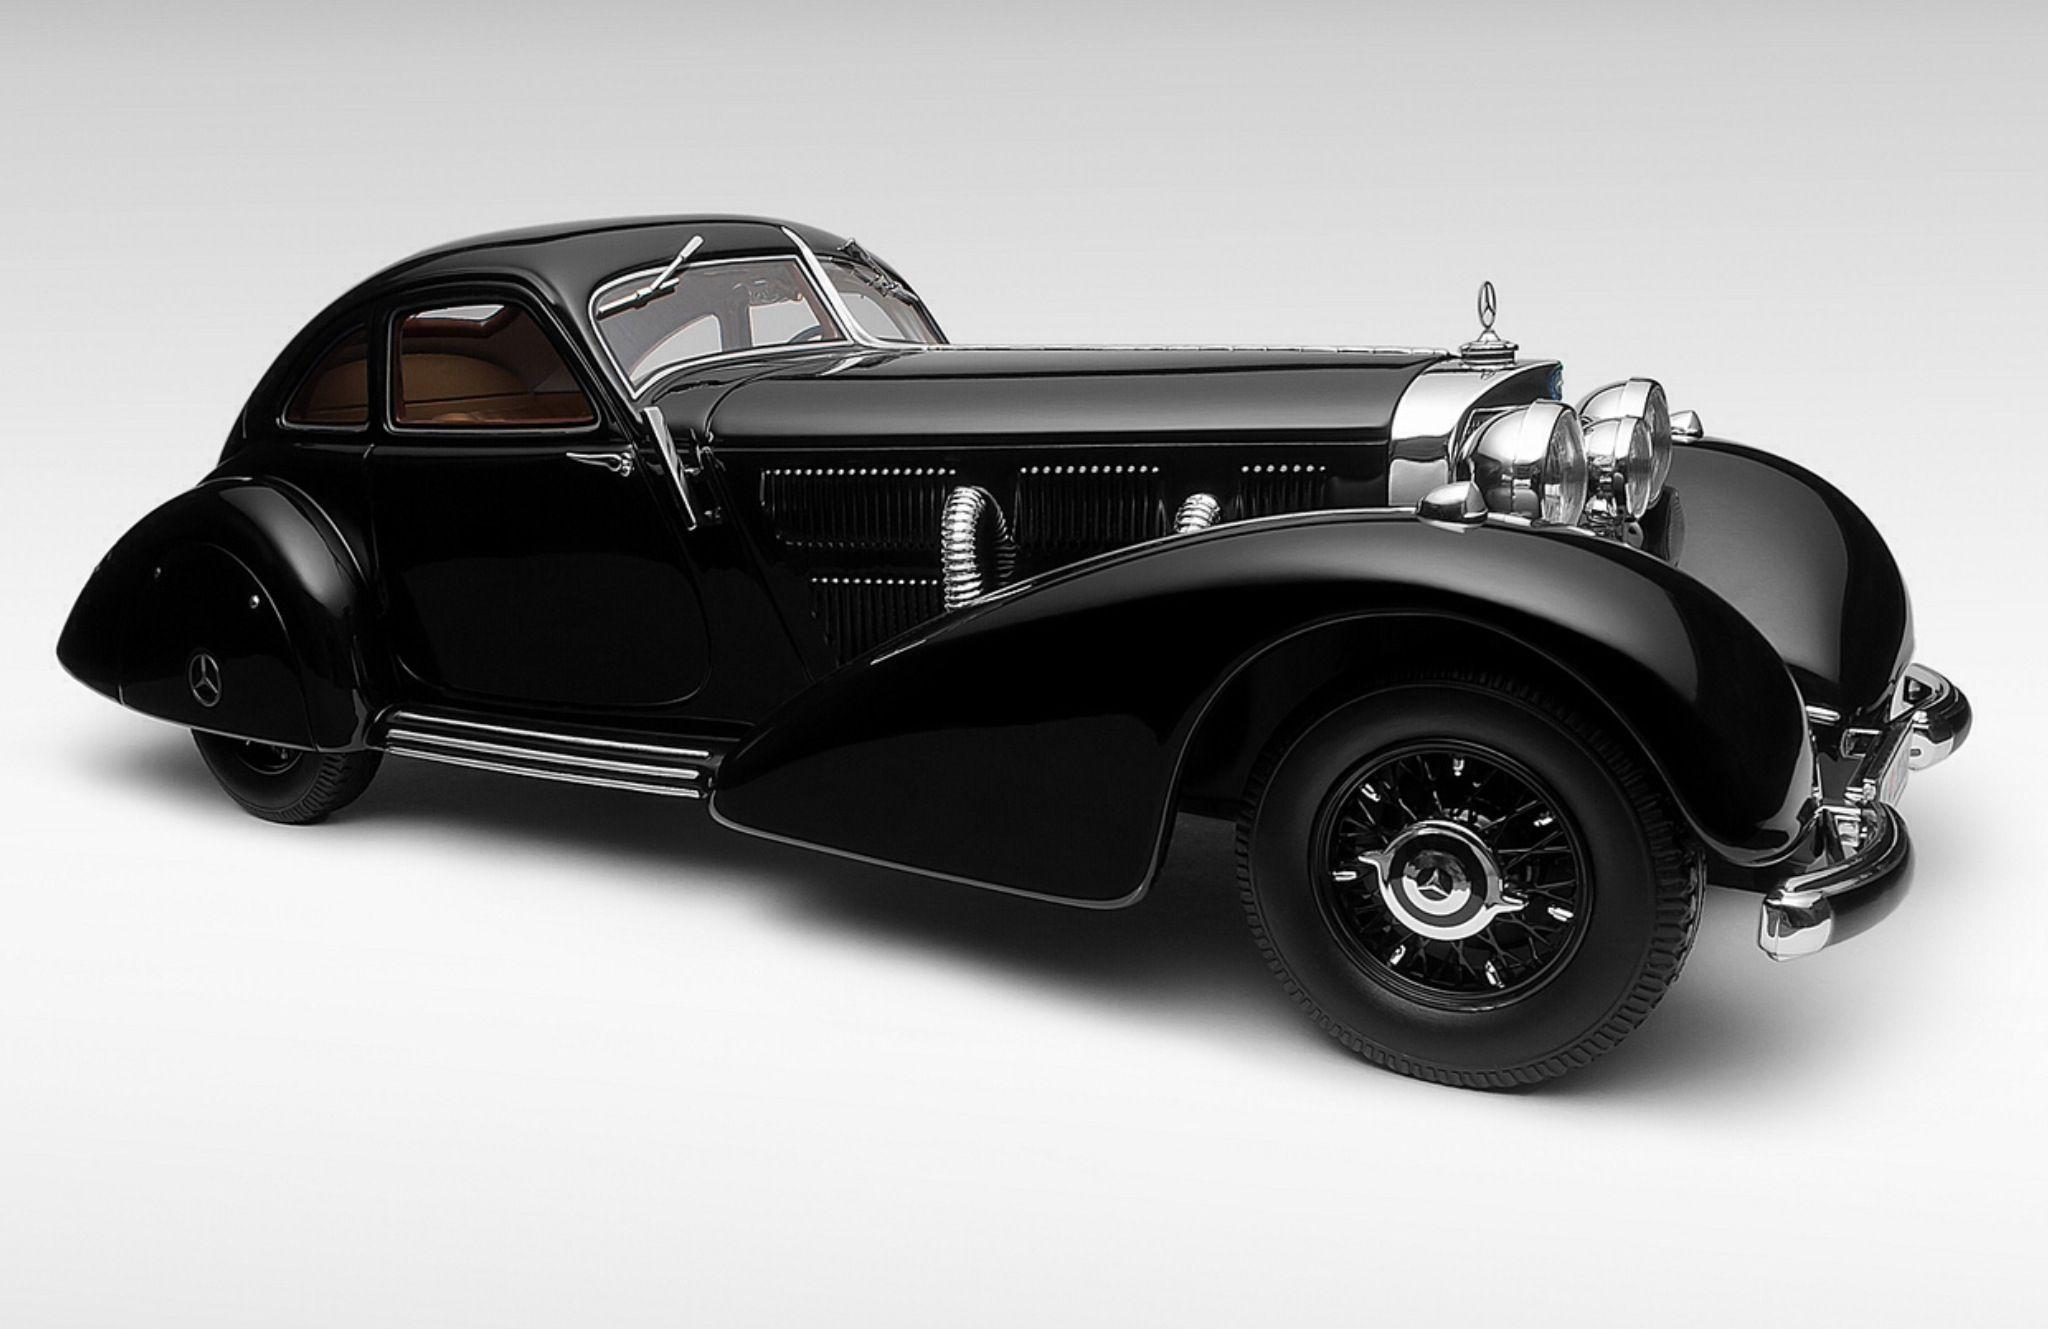 1934 mercedes benz 540k autobahn kuner coupe carros for Mercedes benz autobahn